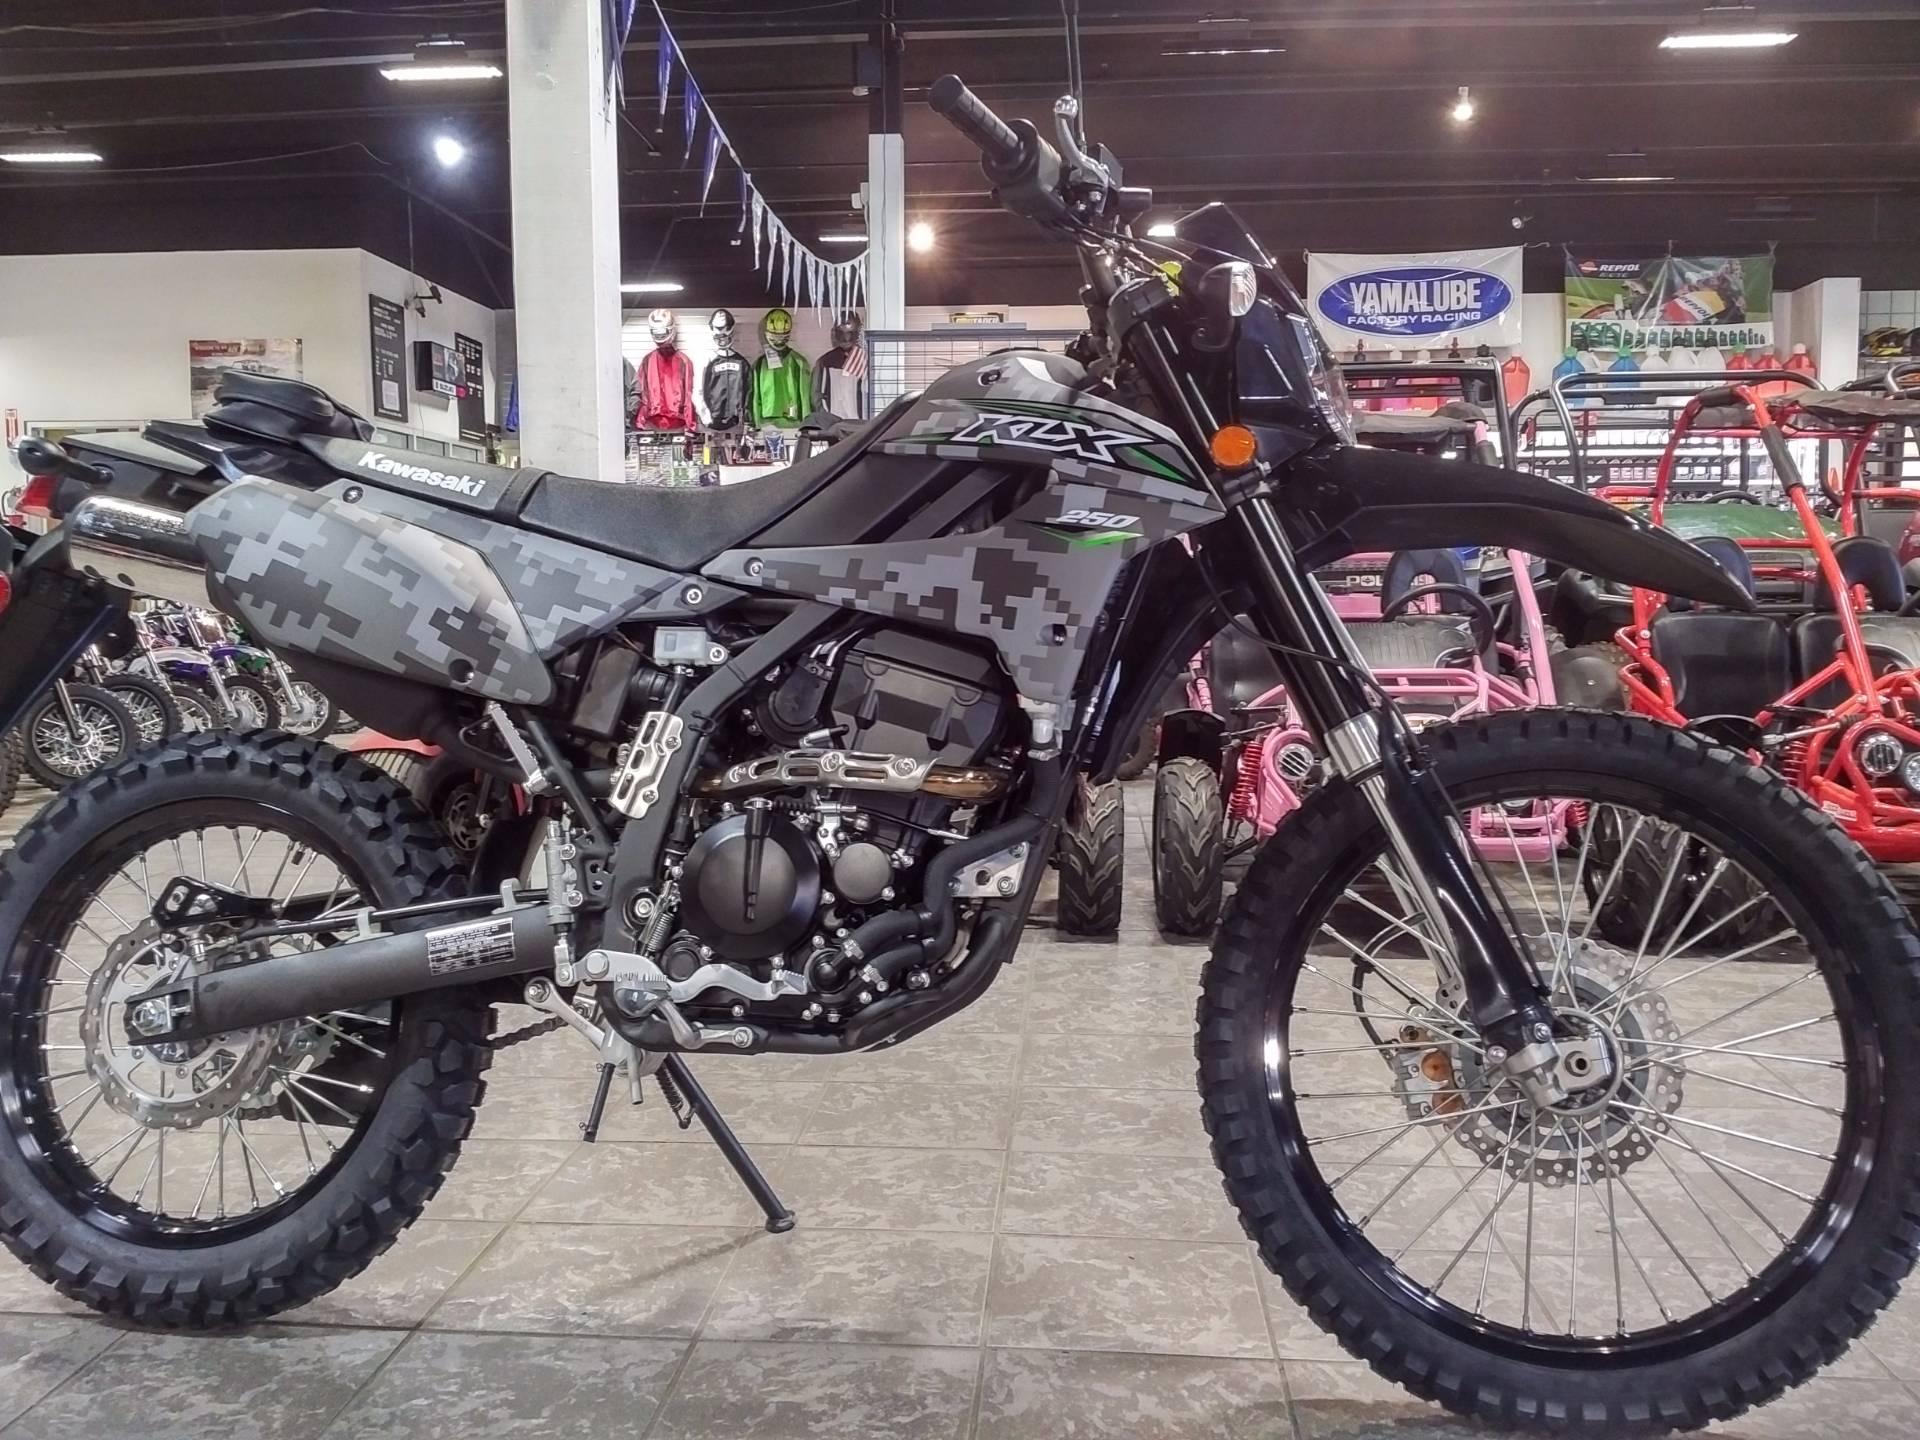 New 2018 Kawasaki KLX 250 Camo powersports in Salinas, CA | Stock ...